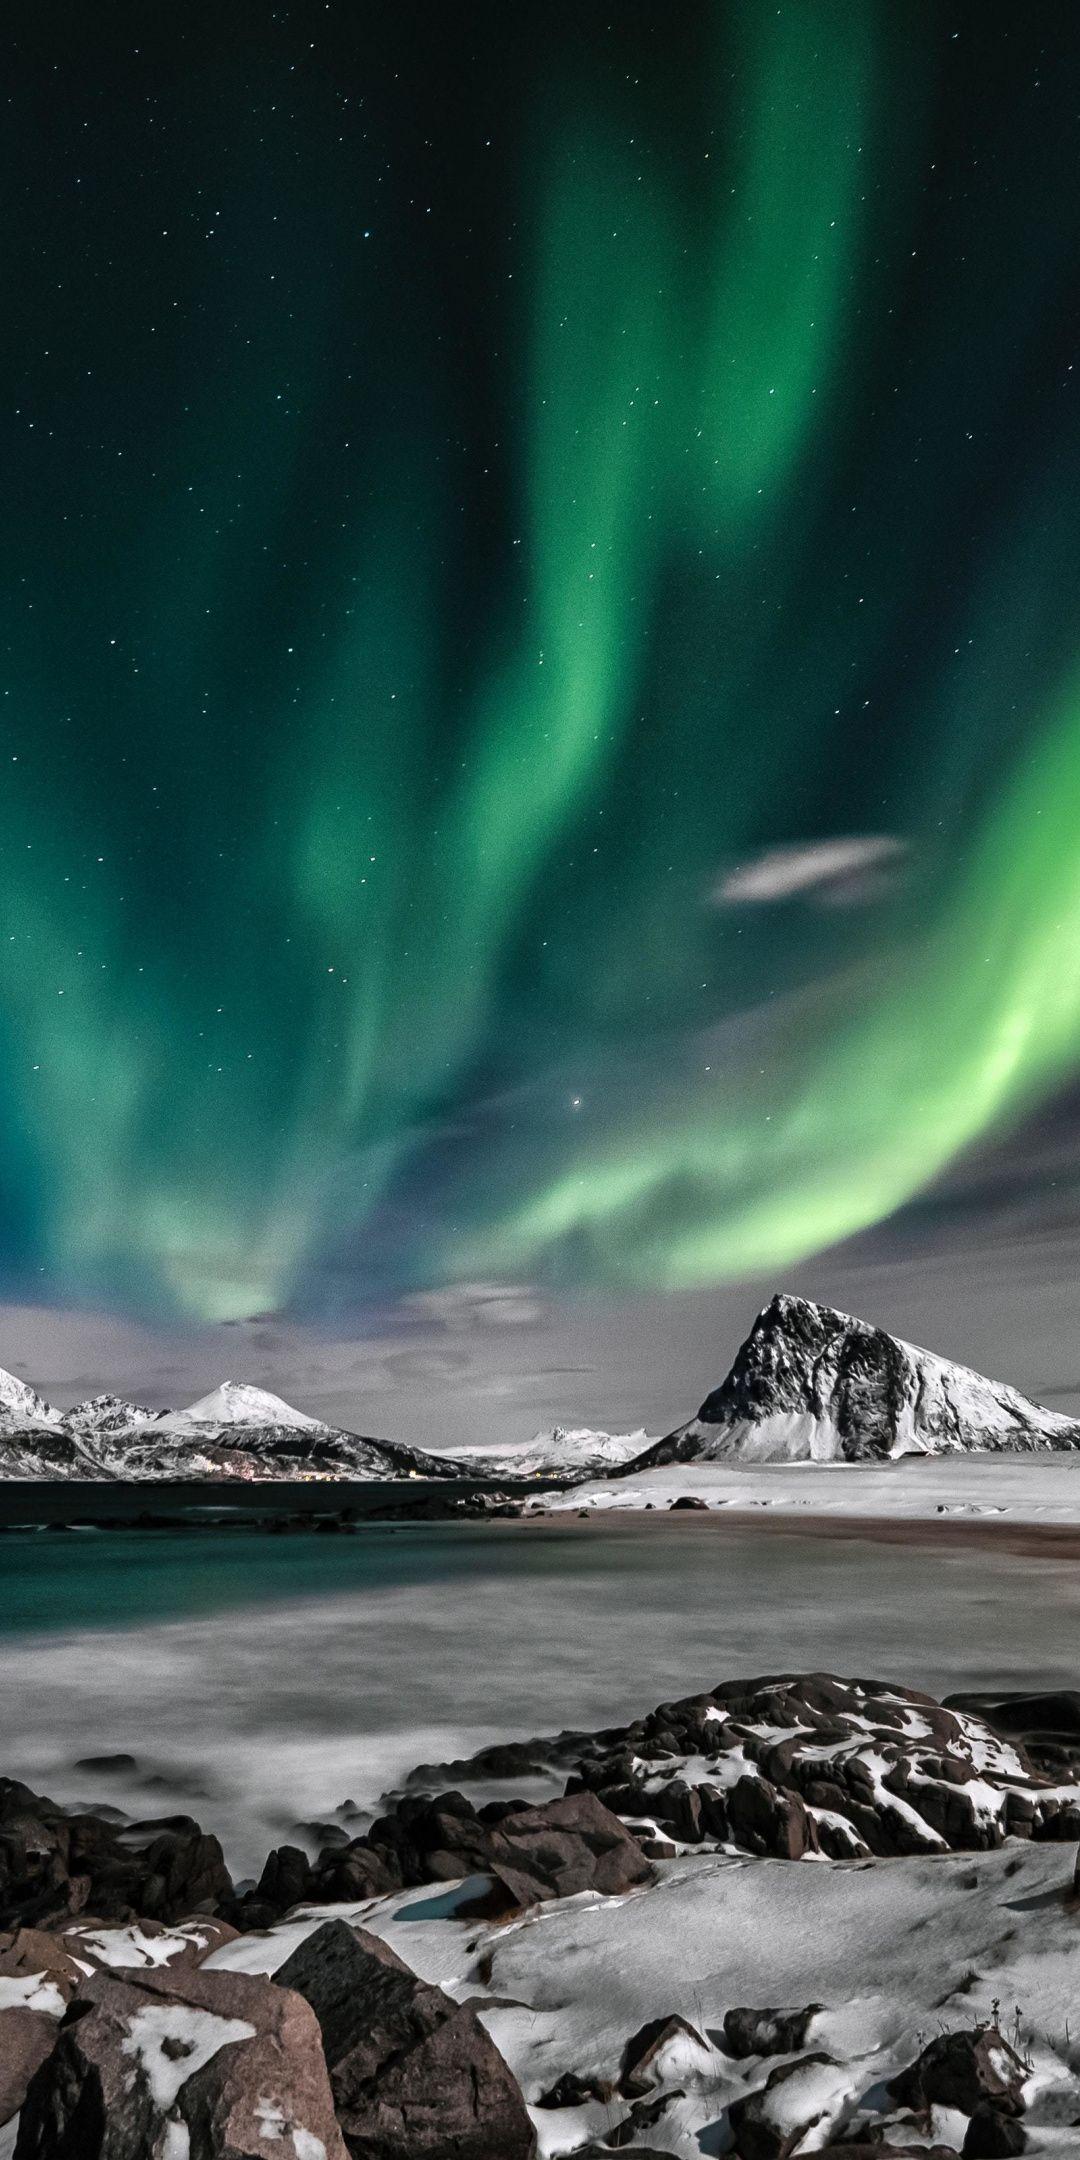 Aurora Nature Colorful Sky 1080x2160 Wallpaper Landscape Iphone Wallpaper Wallpaper